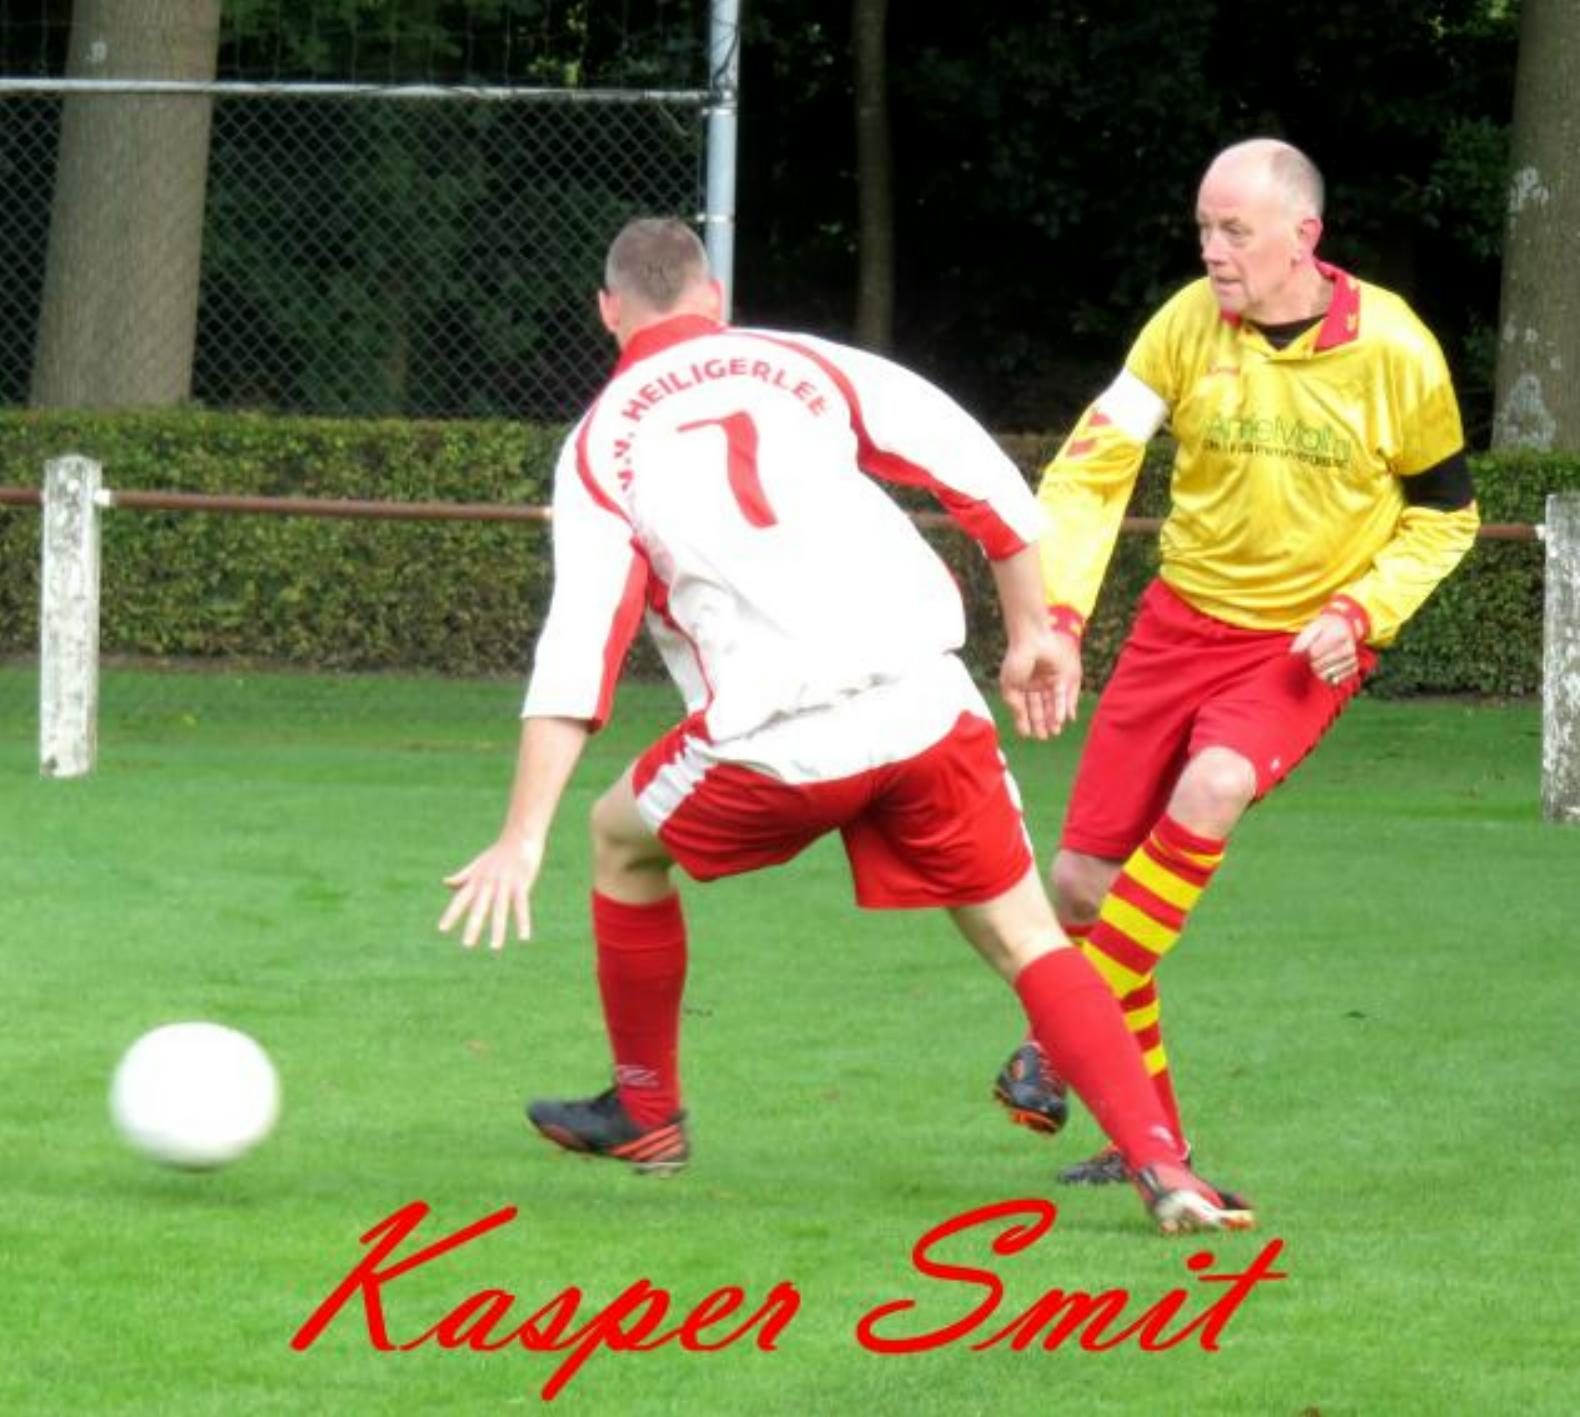 Kasper-Smit